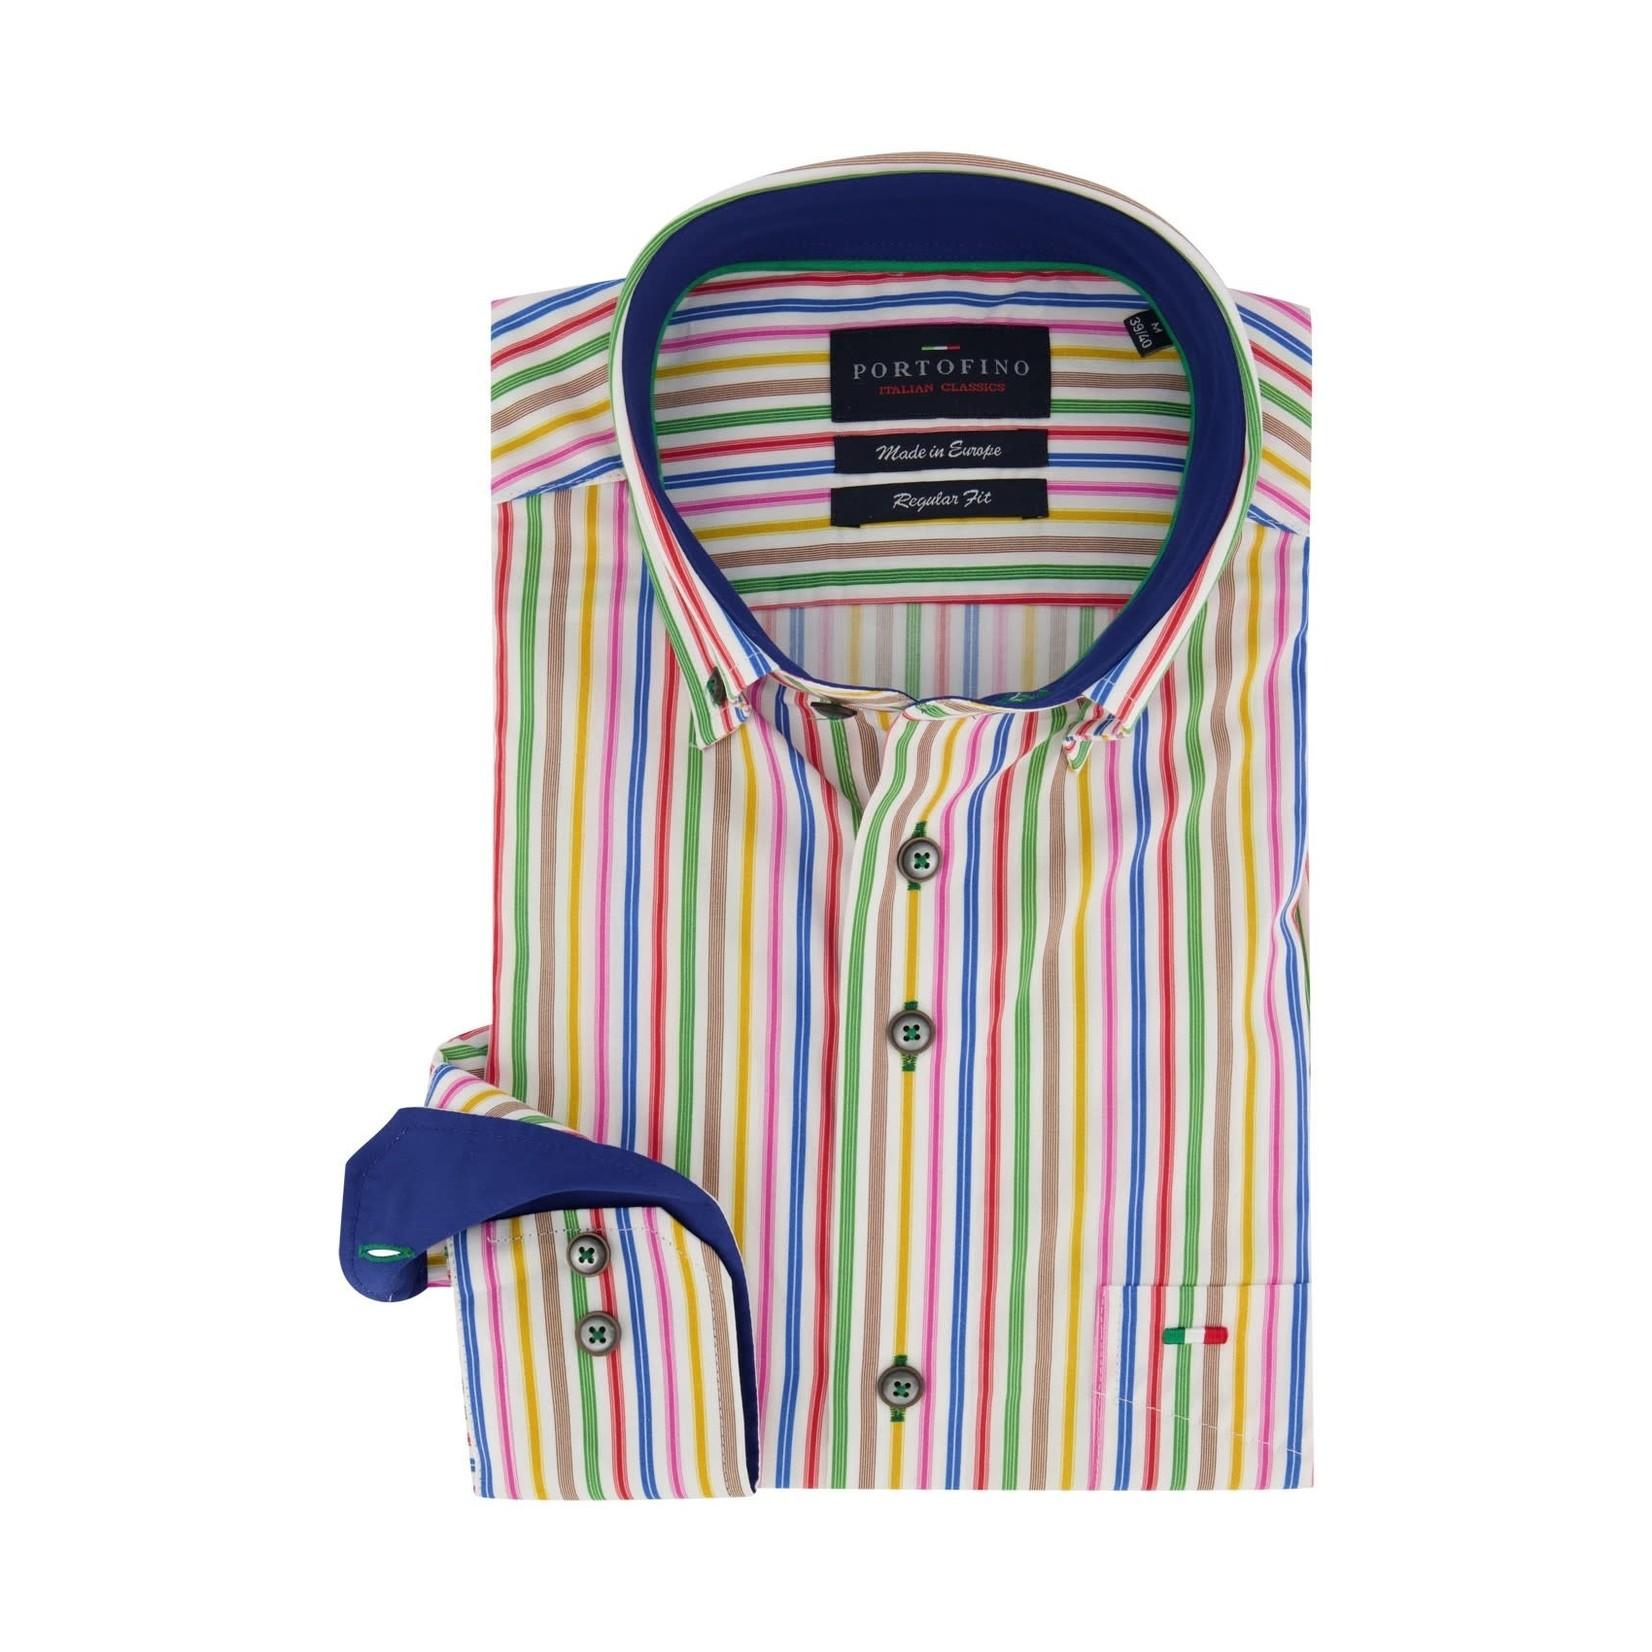 Portofino overhemd regular fit multi colour streep